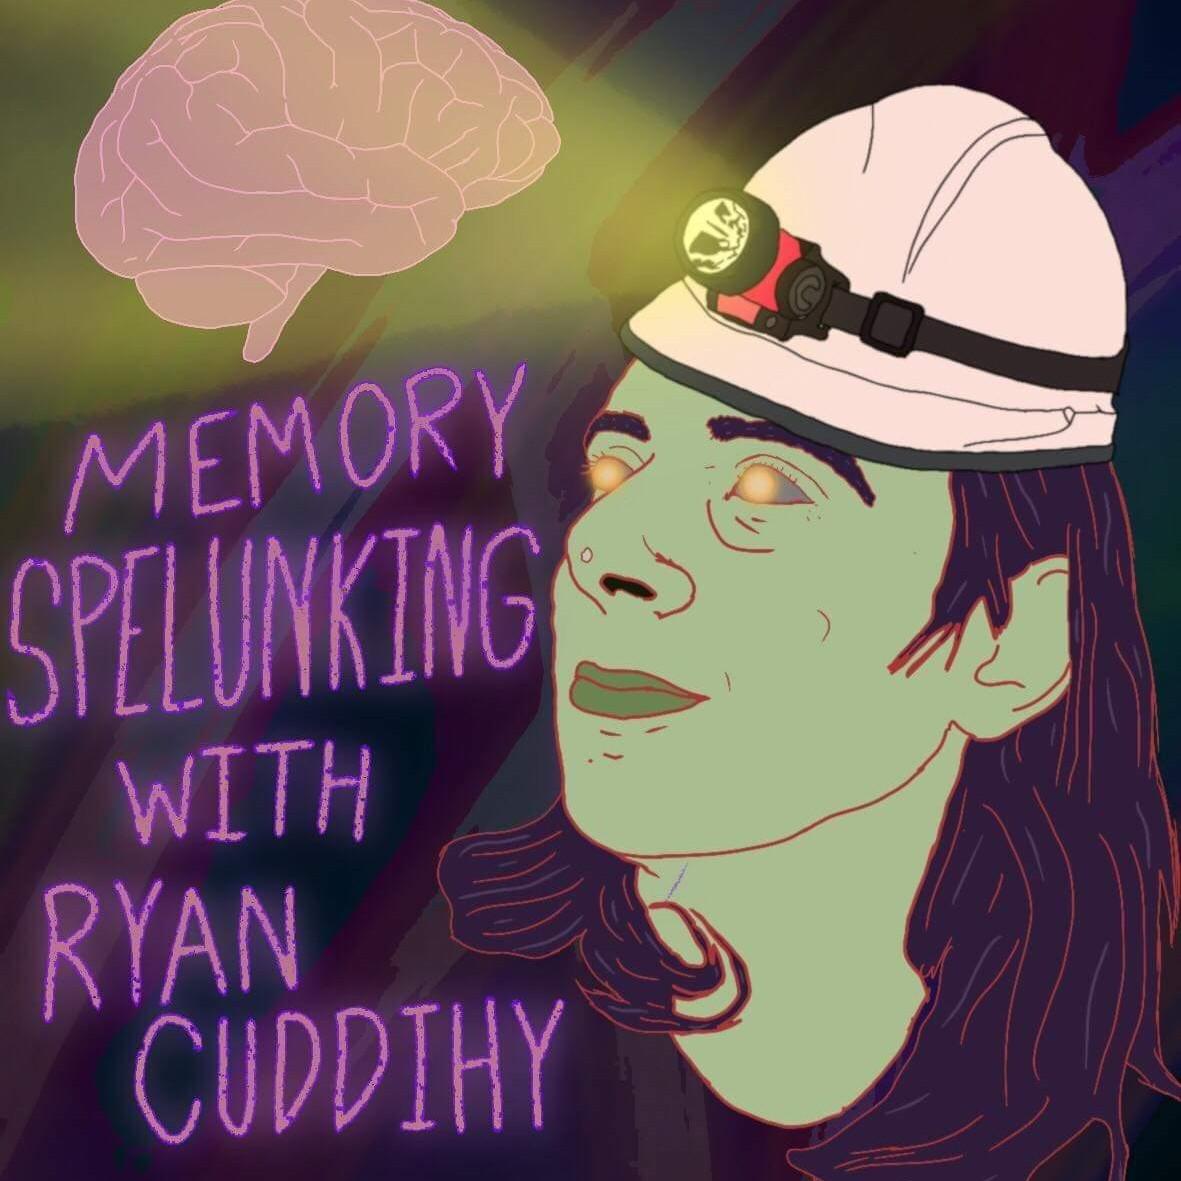 """MotoCrashCon"" Memory Spelunking with Ryan Cuddihy"